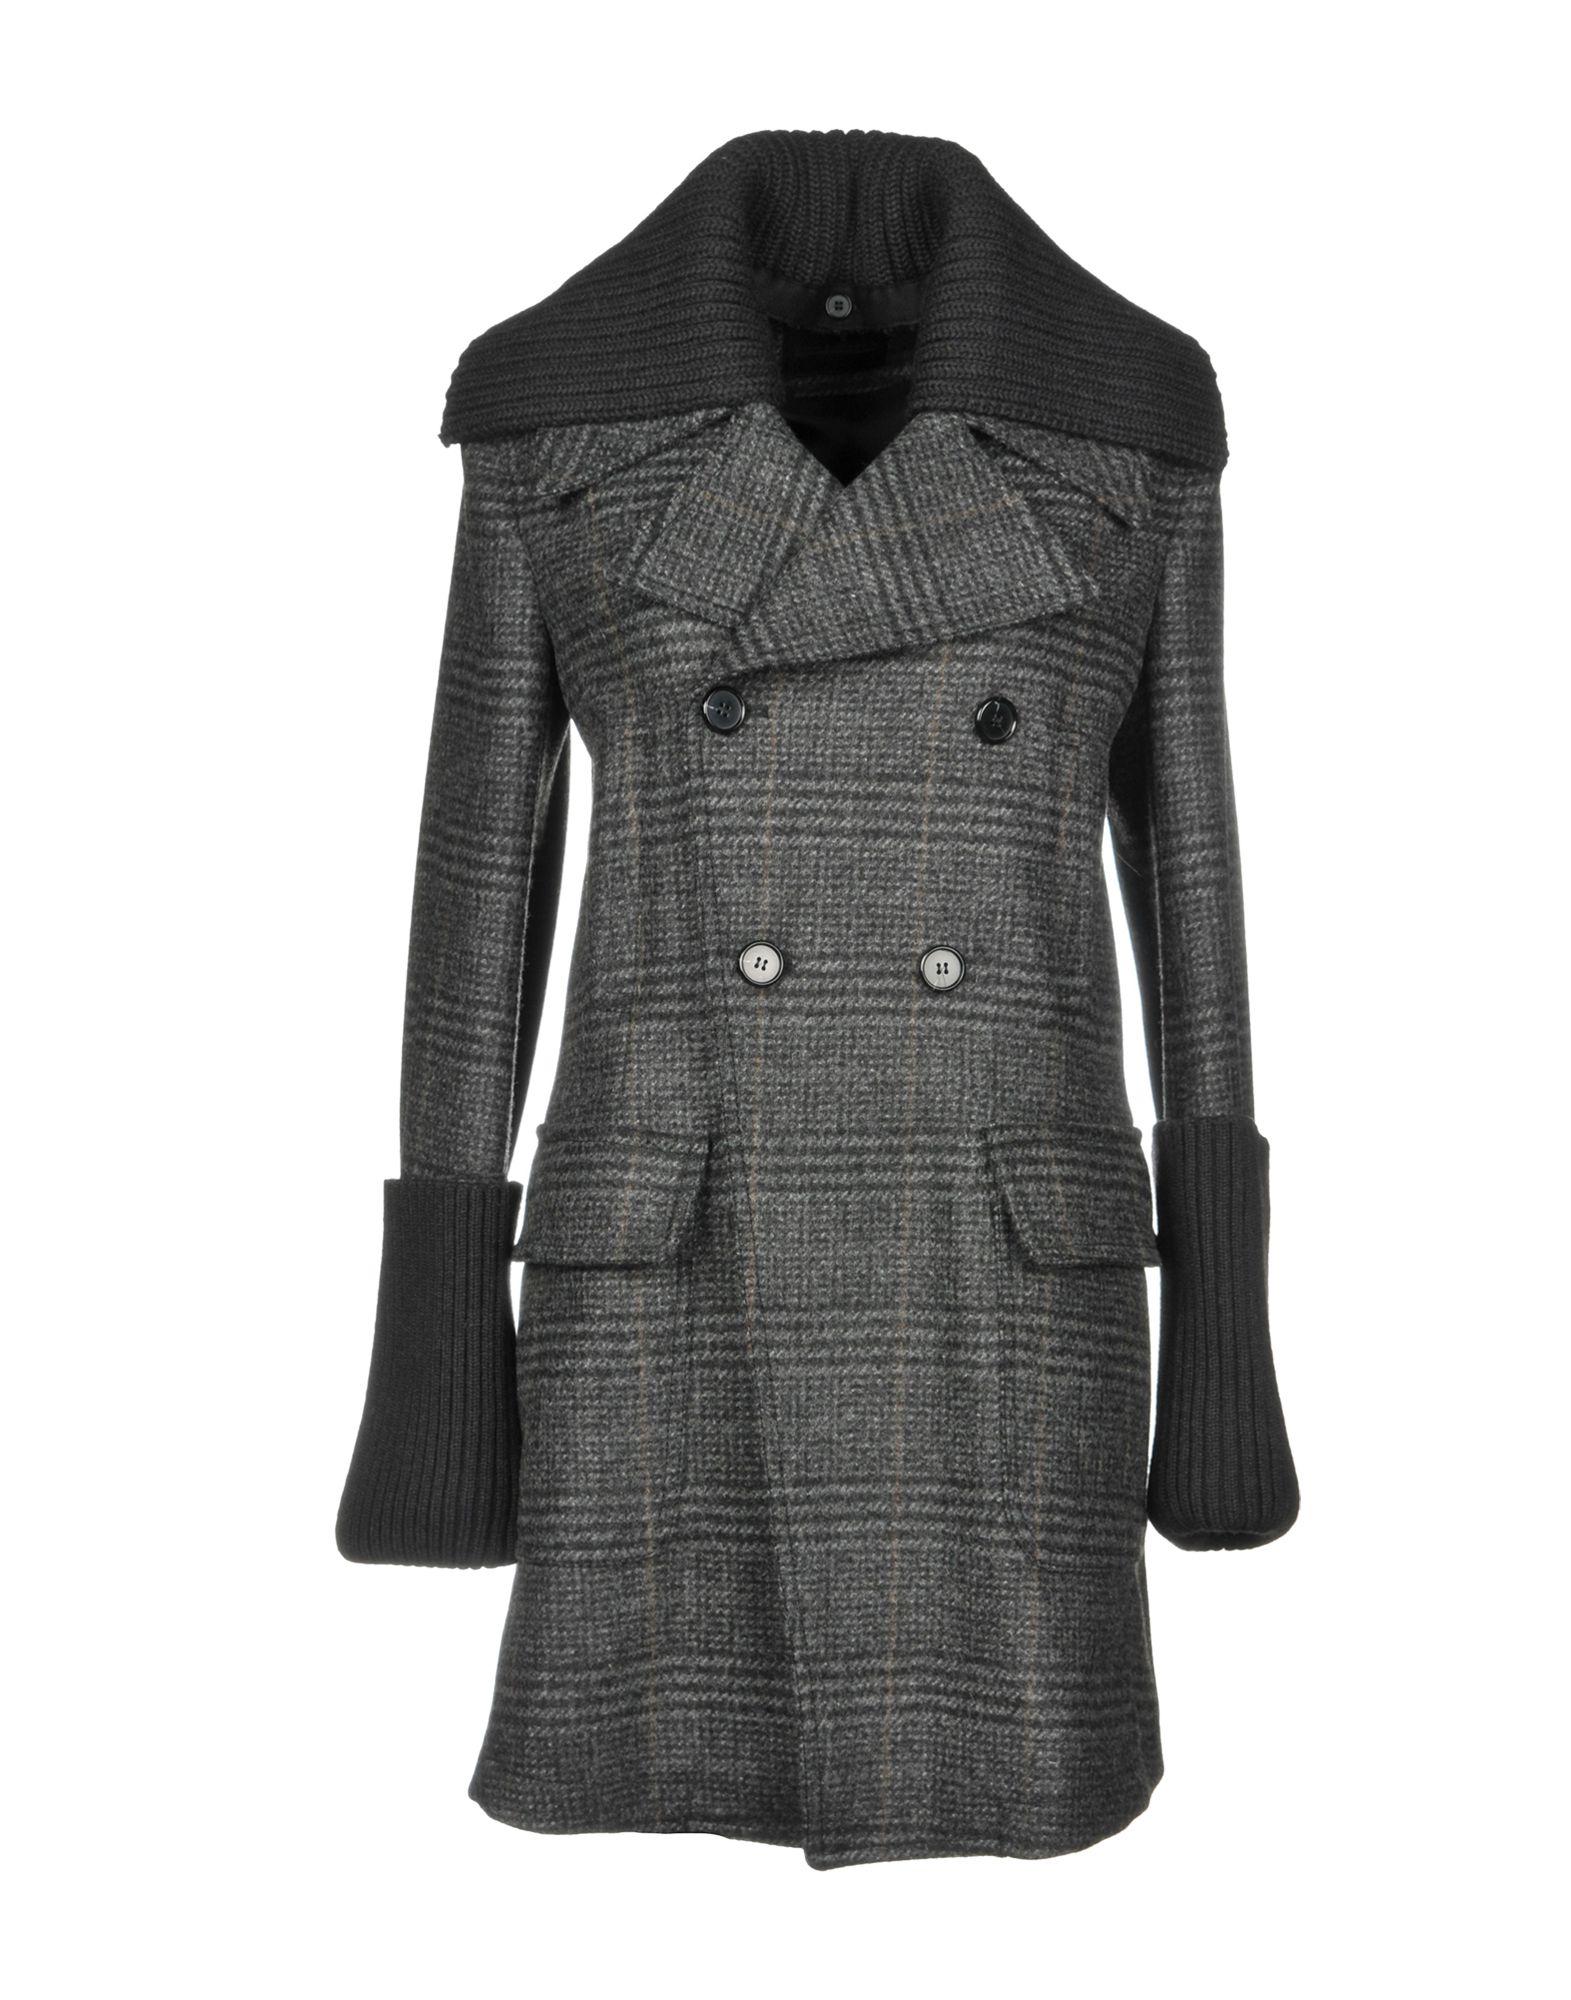 Coat in Lead